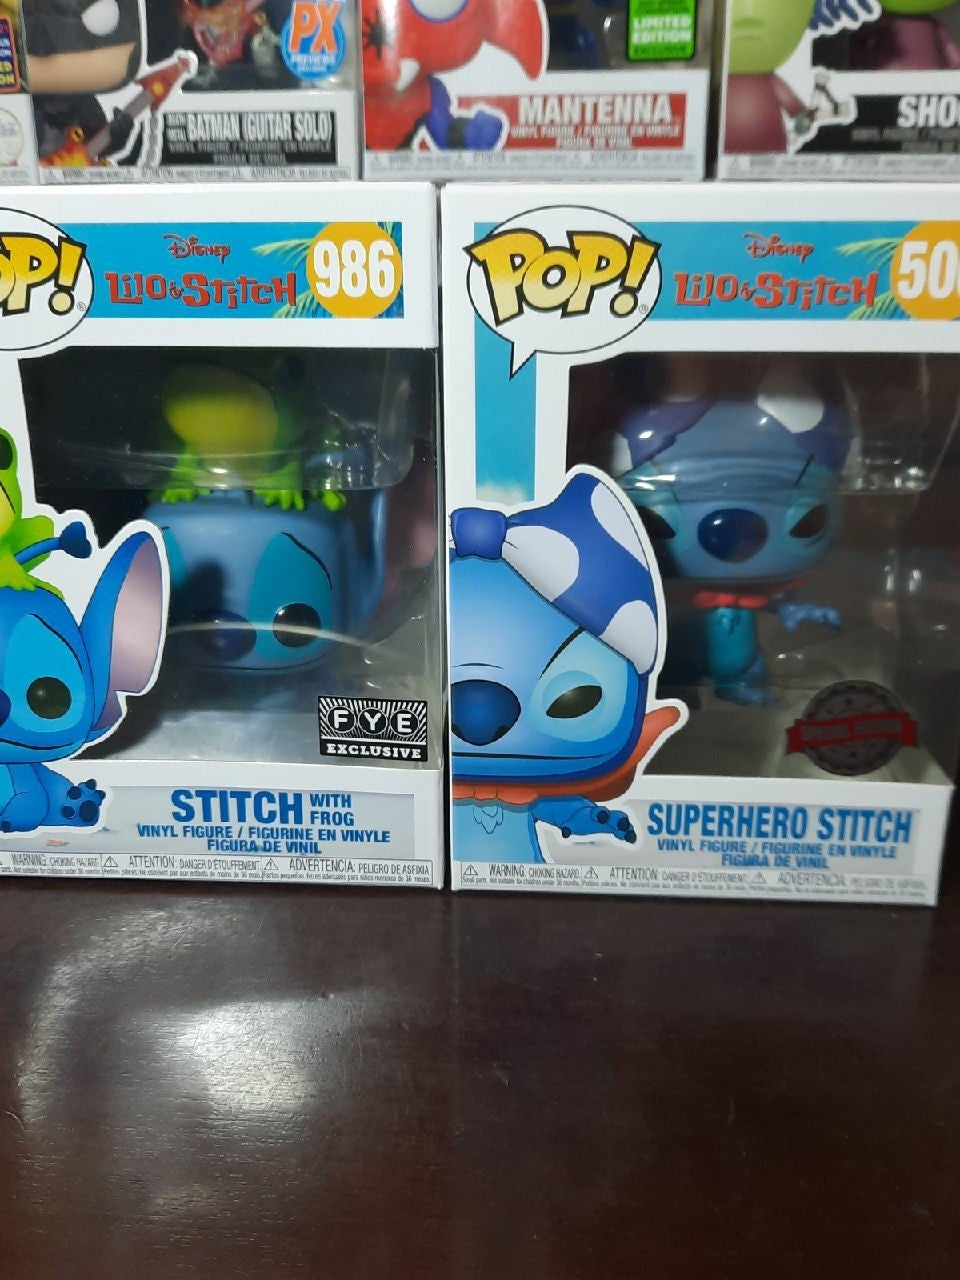 Stitch Funko Pops stitch frog & superher